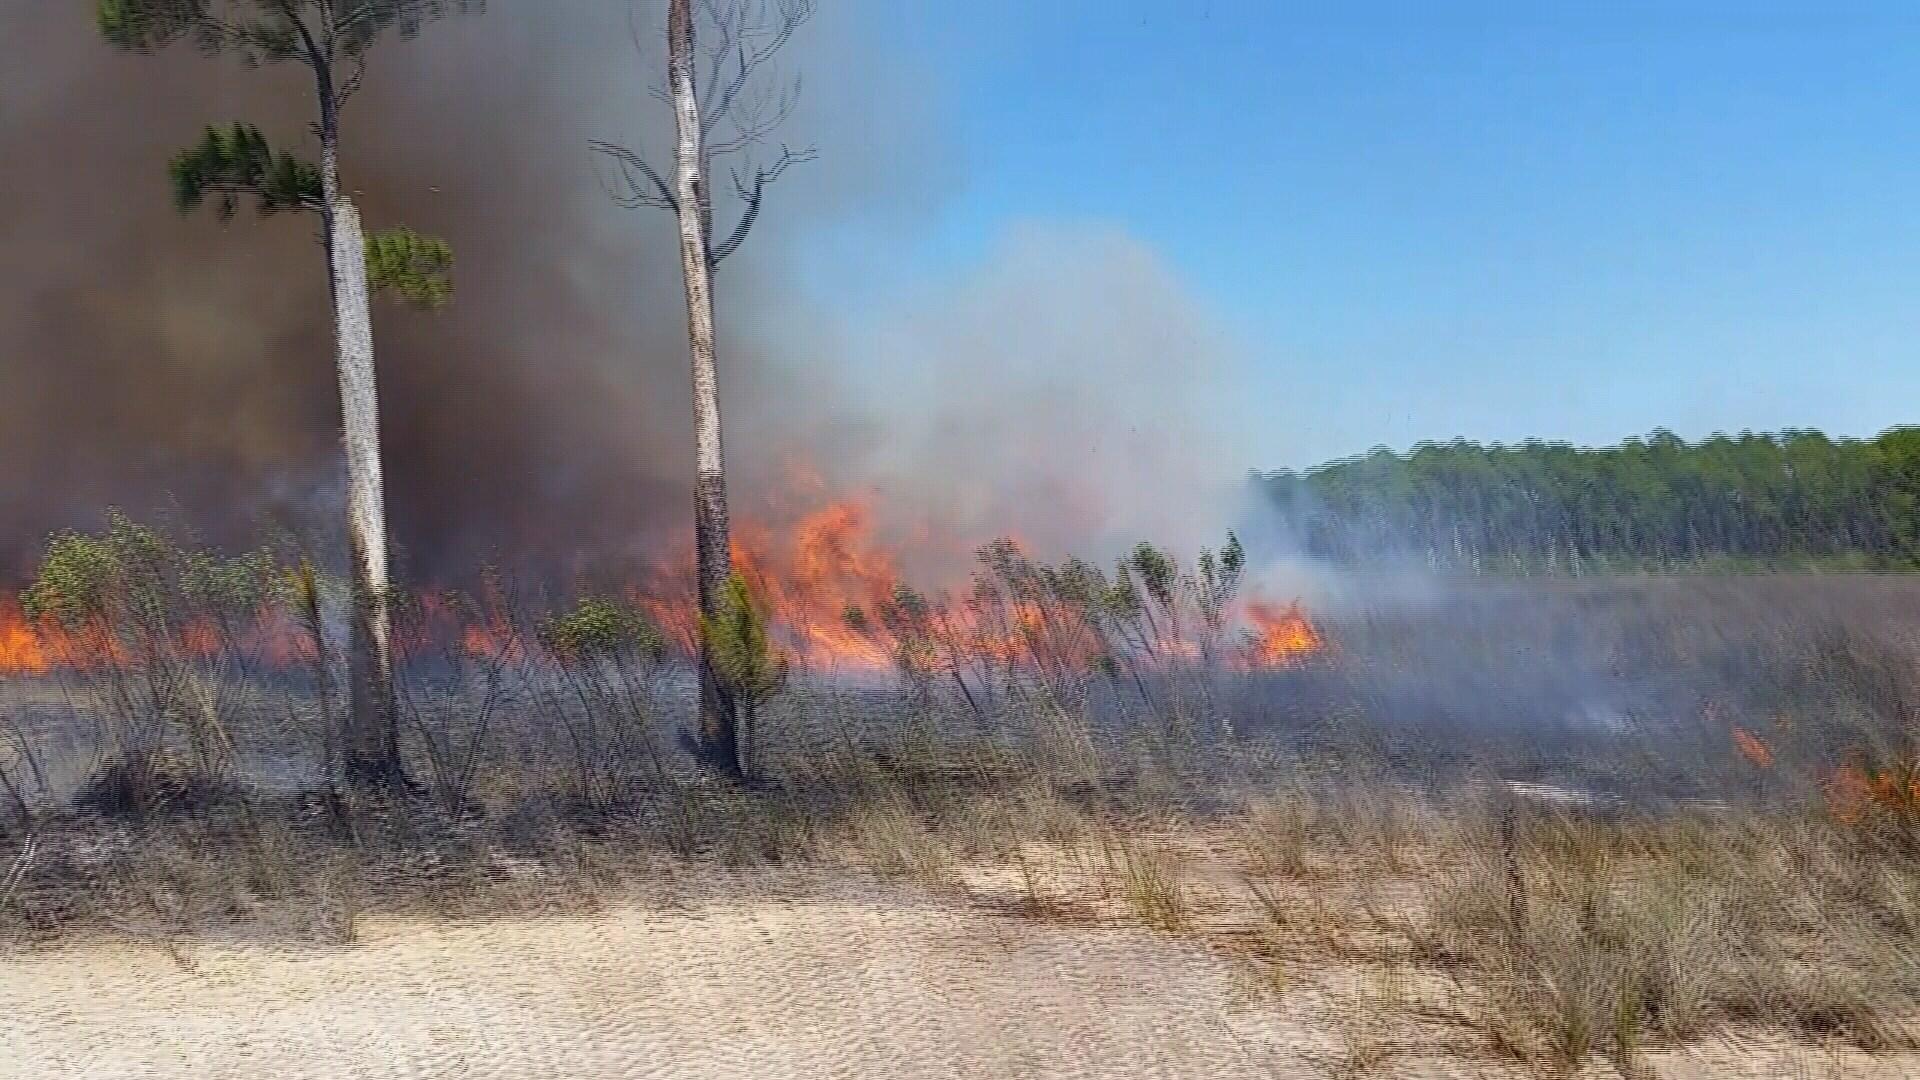 Control burn on a Mississippi wetland